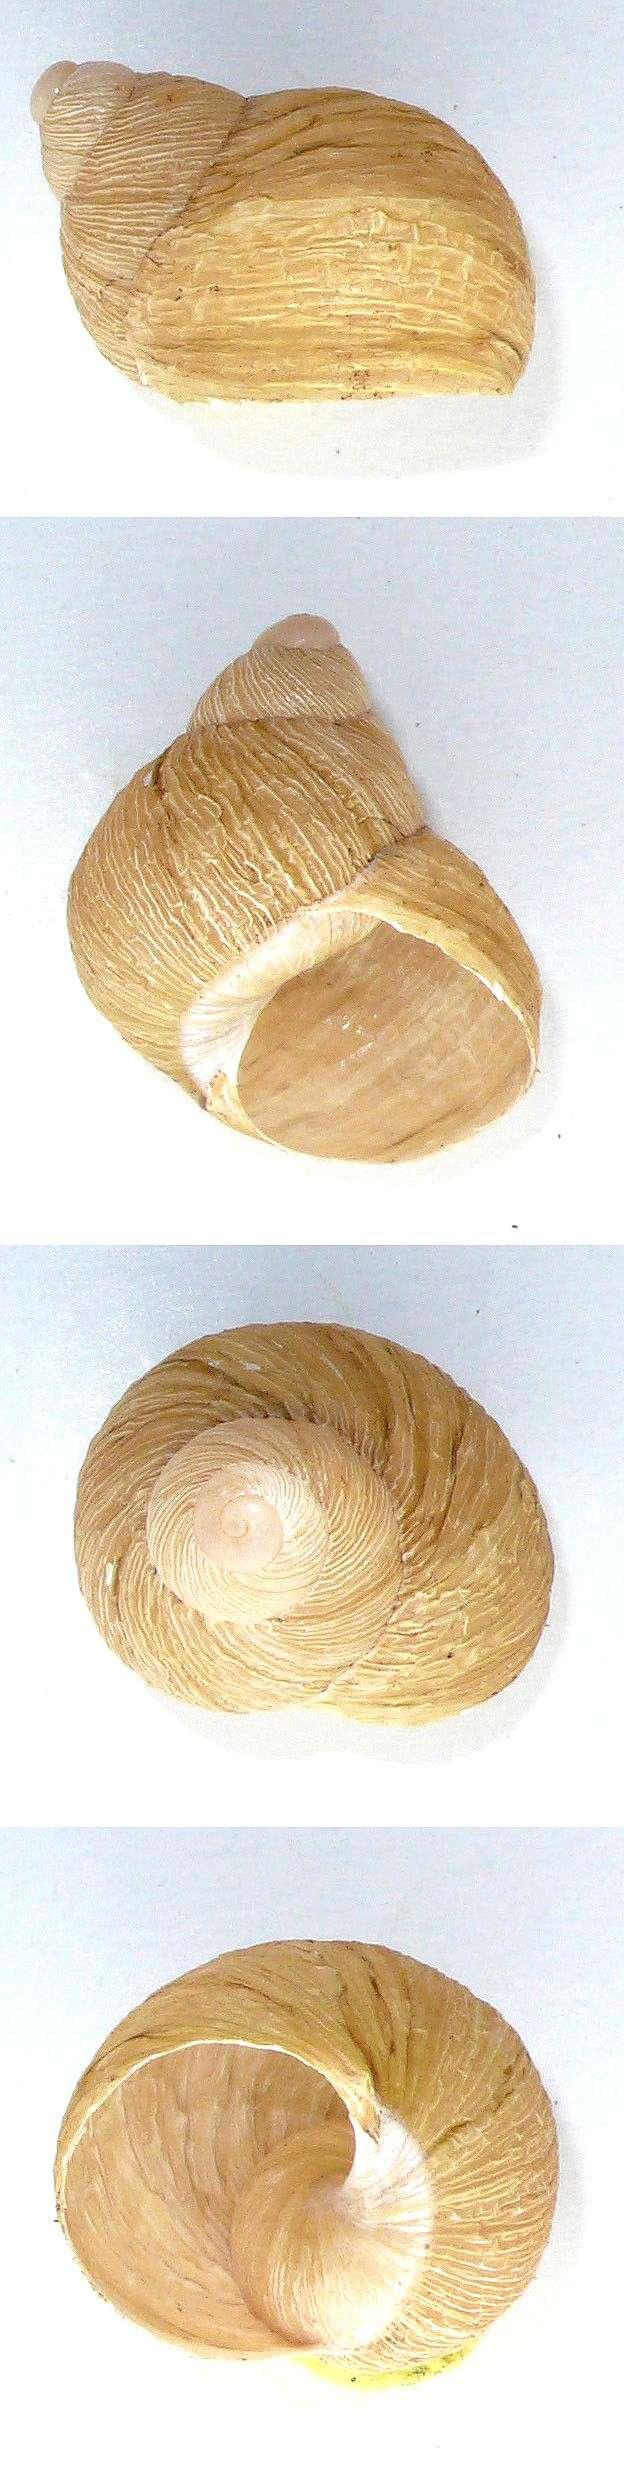 Erctella mazzullii (De Cristofori & Jan, 1832) & Erctella insolida (Monterosato, 1892) & Erctella cephalaeditana (Gianuzzi-Savelli, Sparacio & Oliva, 2012) H_mazz14